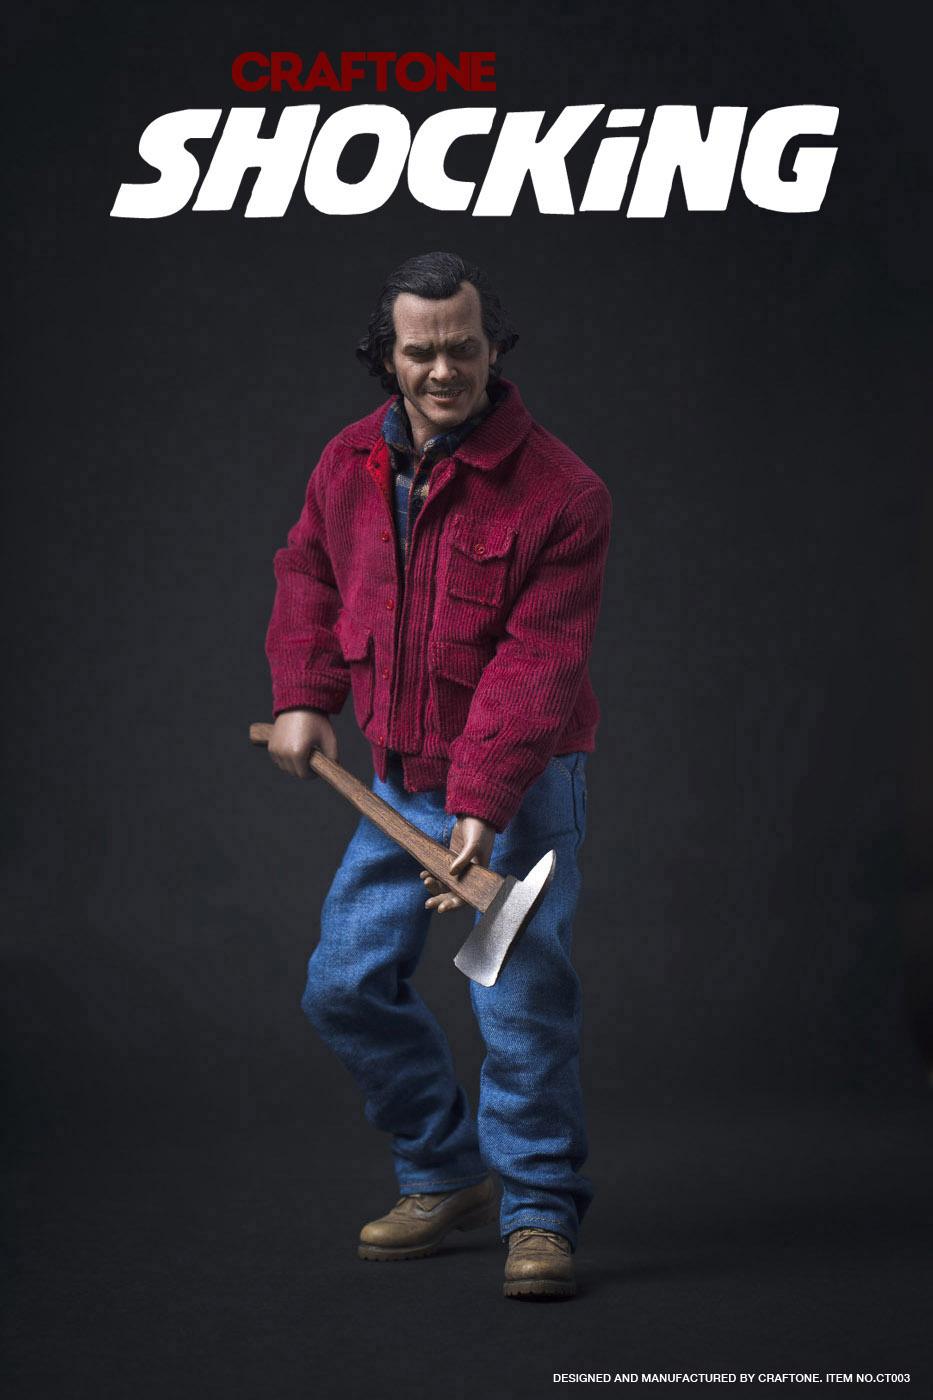 [Craftone] Shocking - Jack Torrance 1/6 scale 183845la7oow5p9ppvopqv